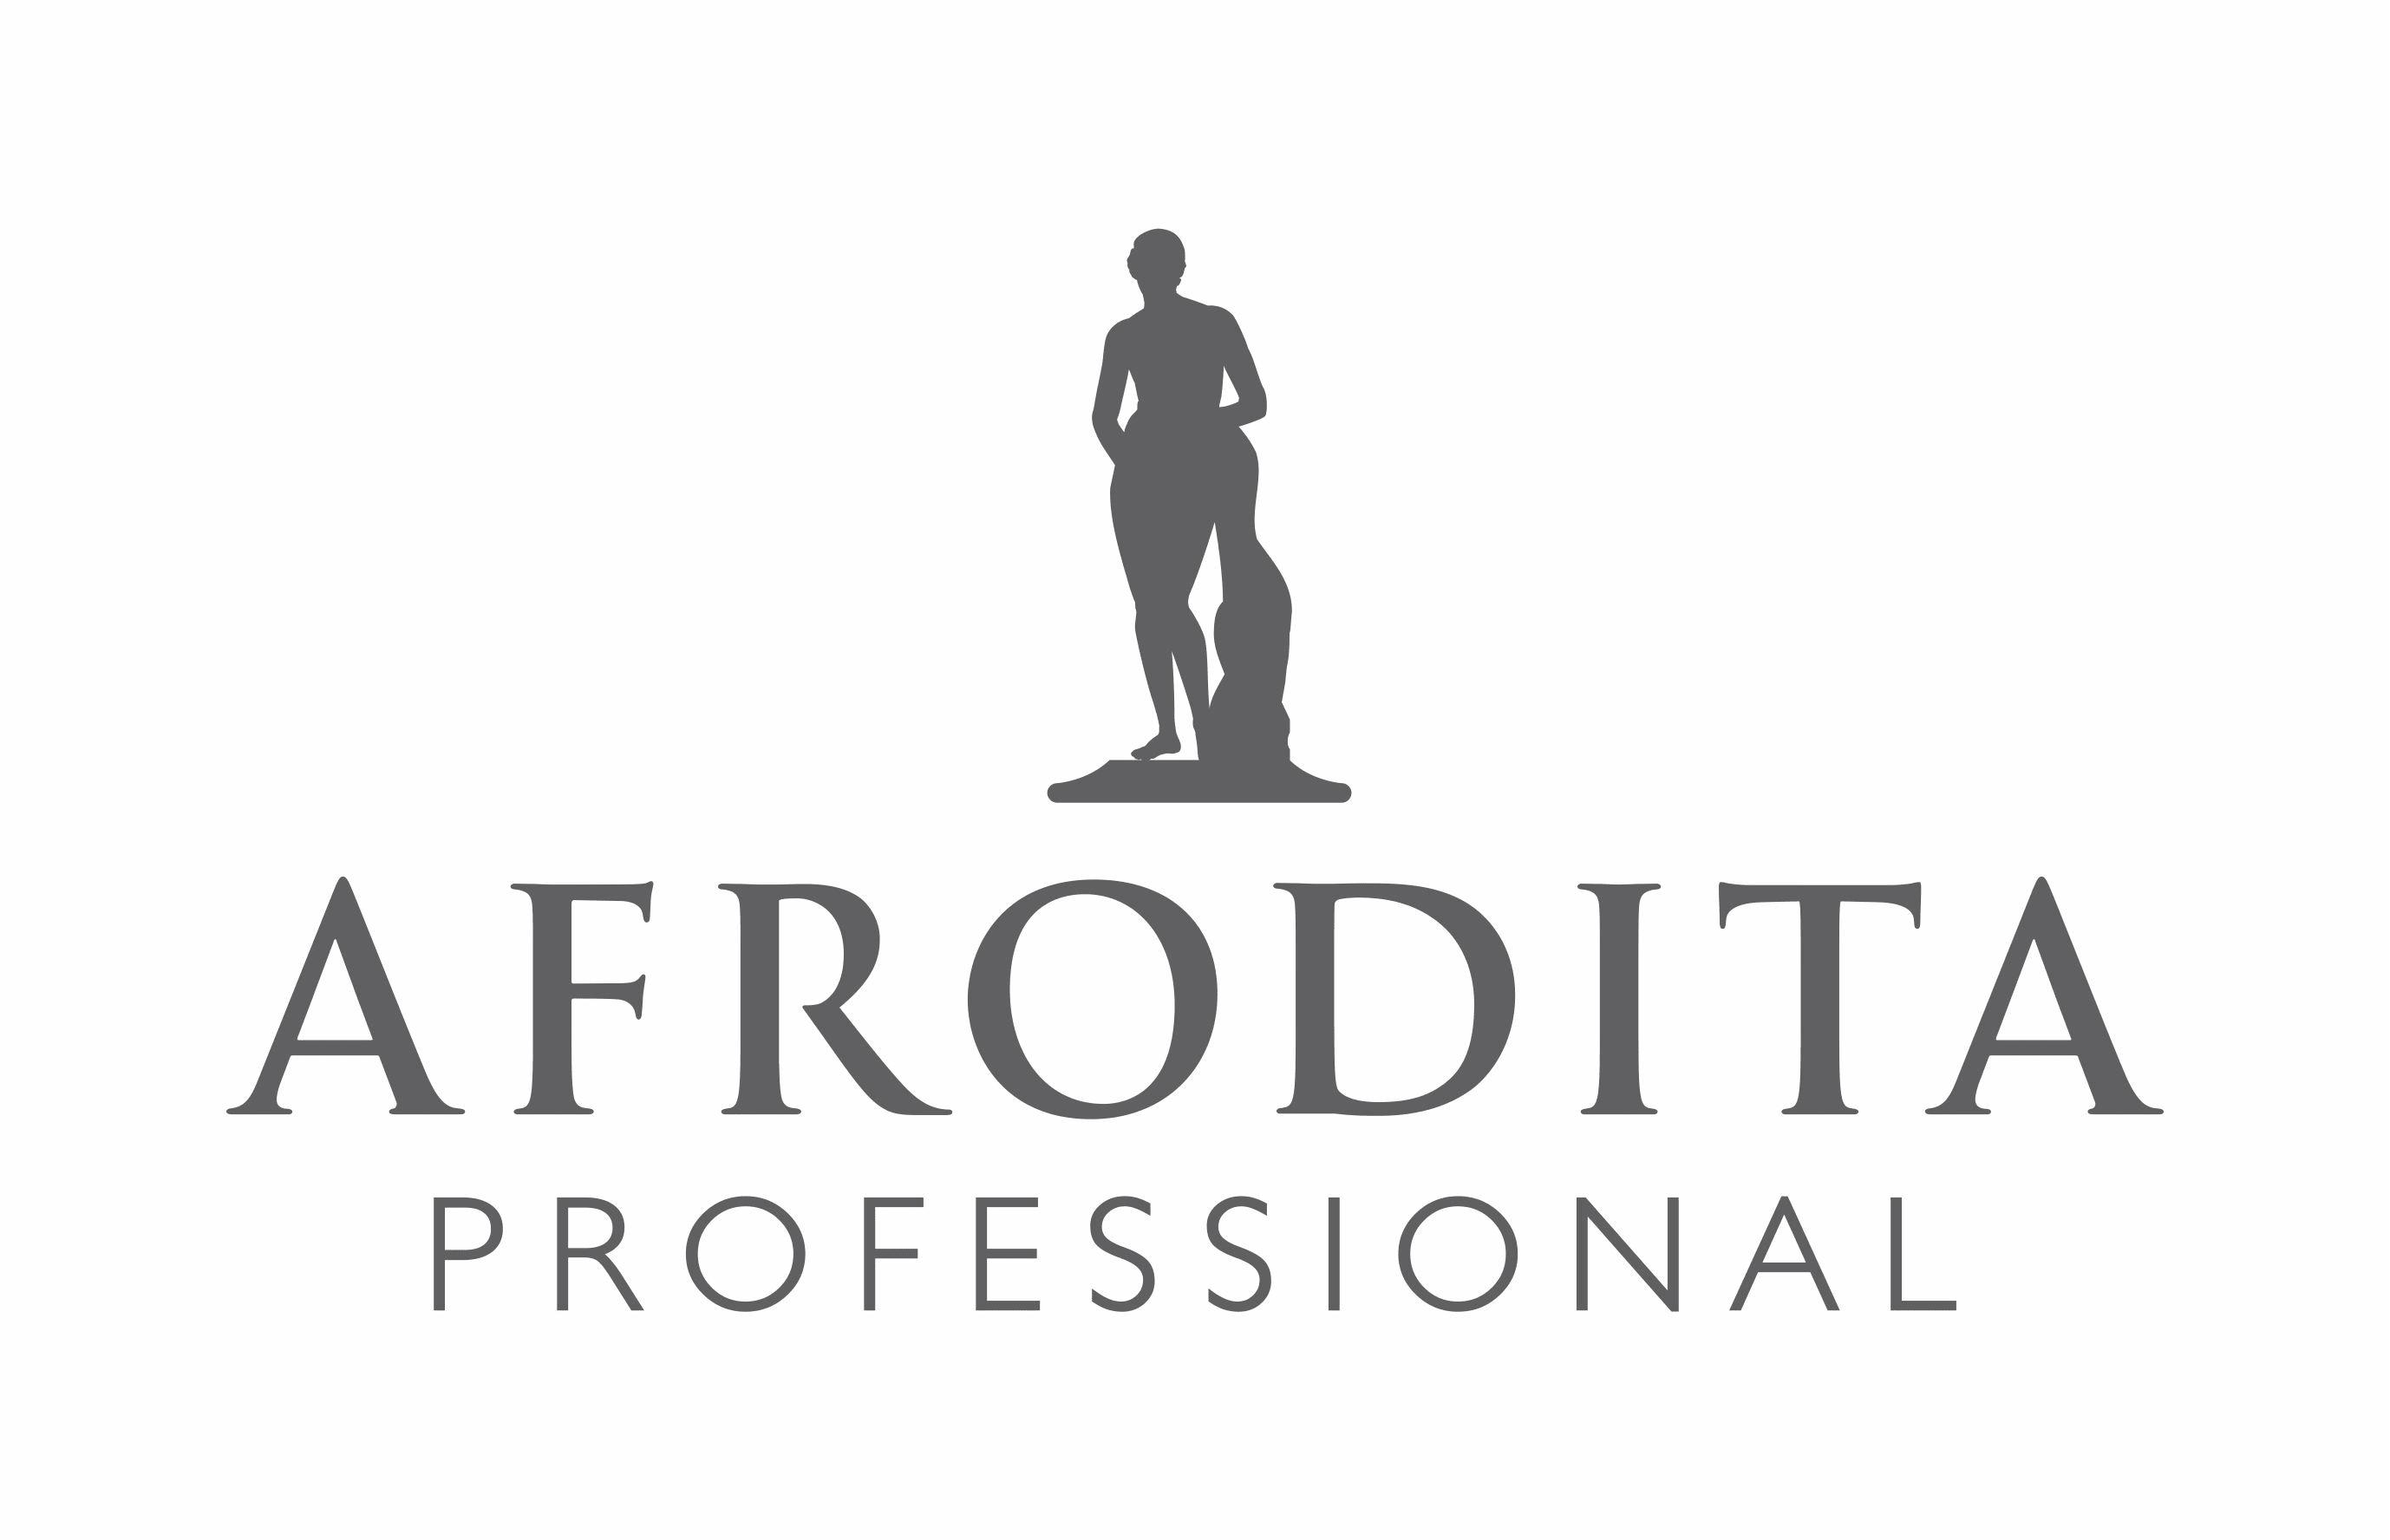 АФРОДІТА ПРОФЕШНЛ / AFRODITA PROFESSIONAL